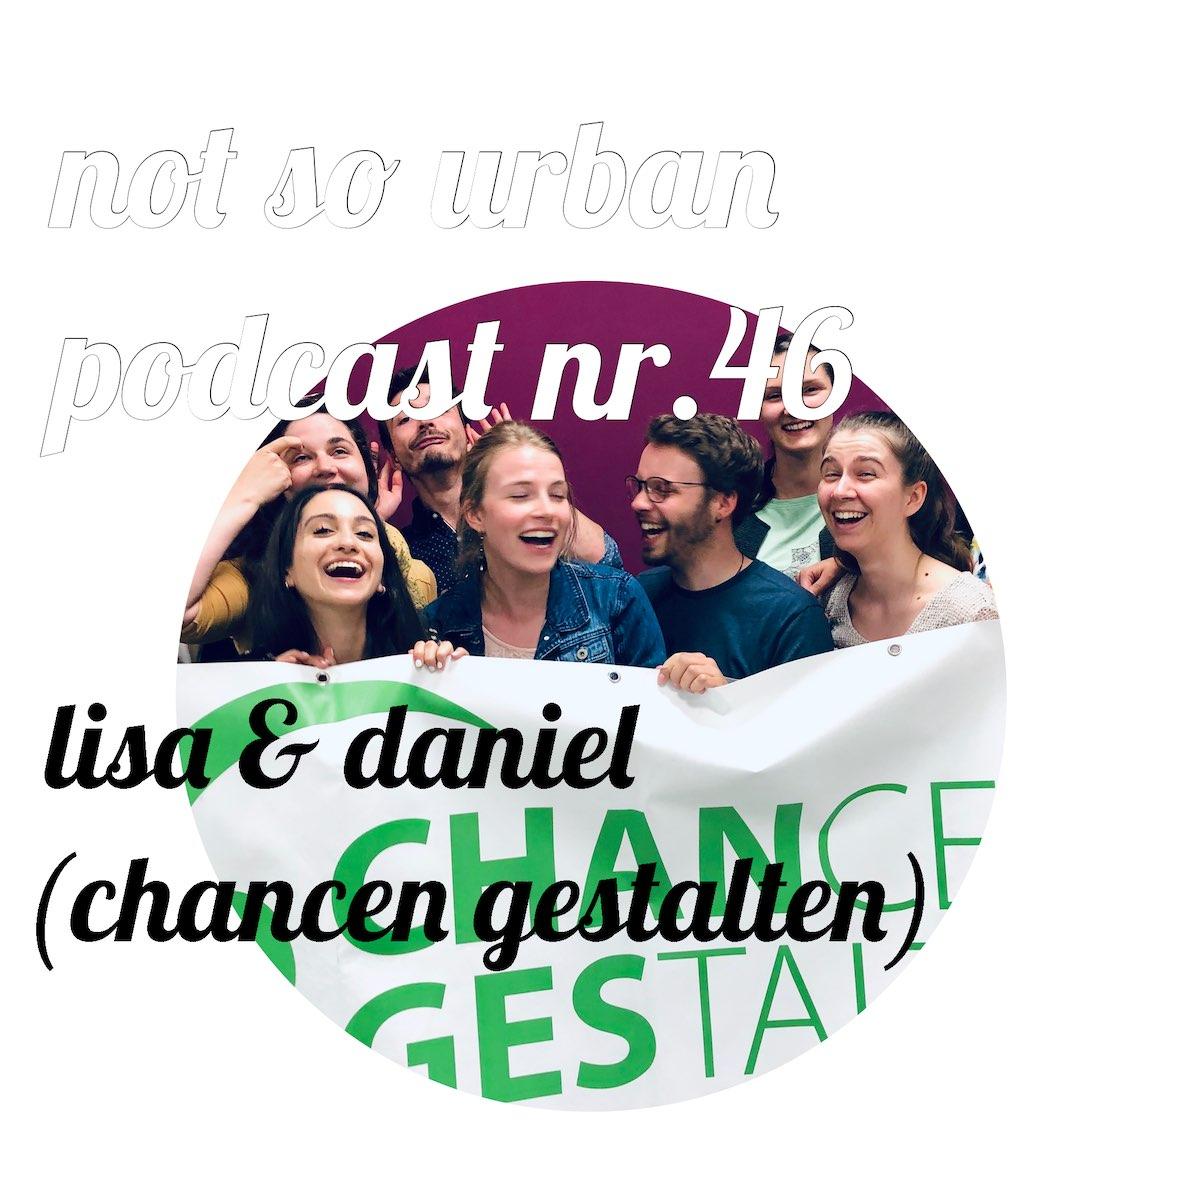 not so urban Podcast Nr. 46 Lisa & Daniel (Chance gestalten)